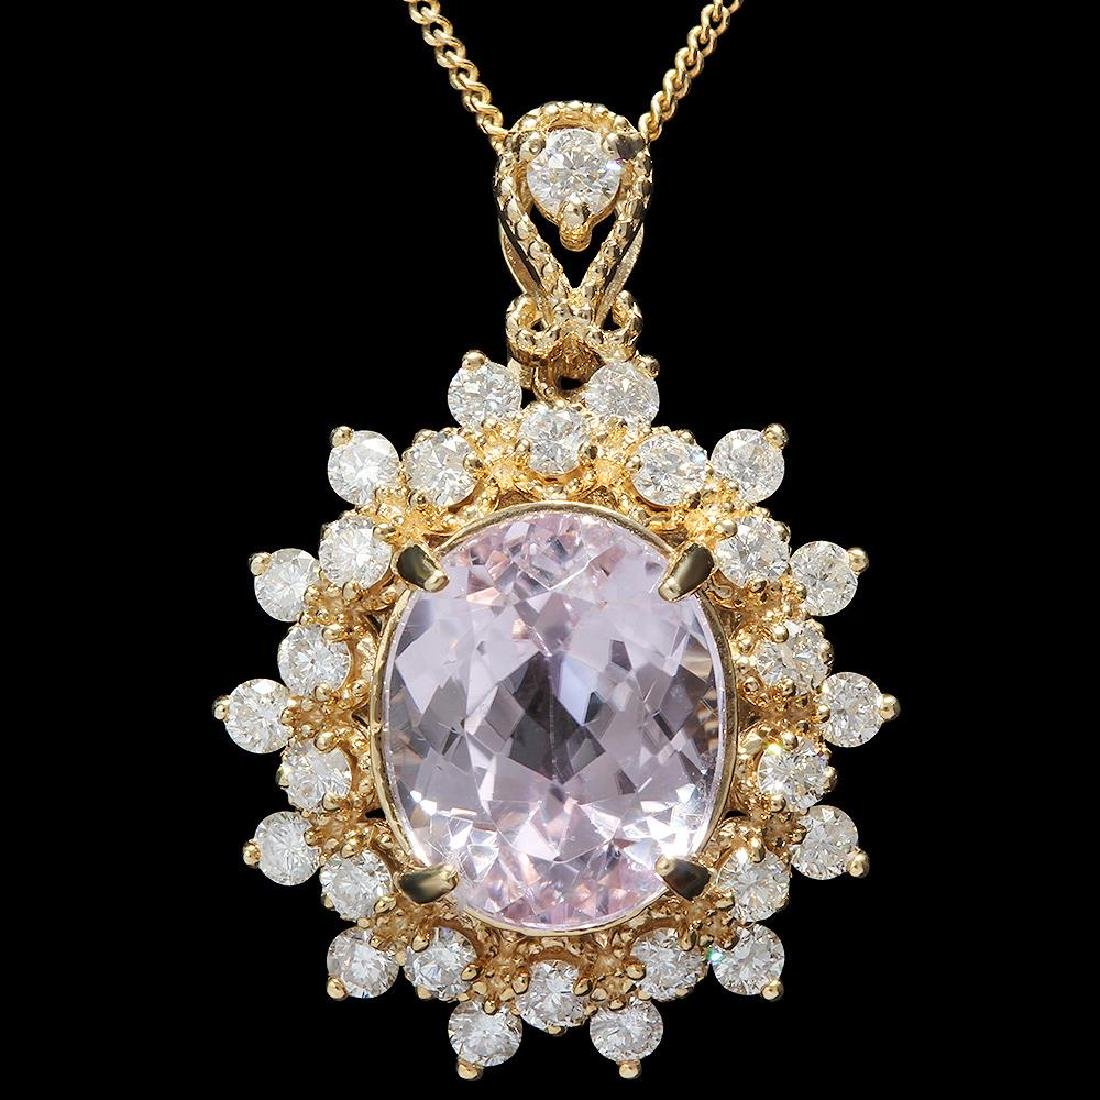 14K Gold 5.30ct Kunzite 1.00ct Diamond Pendant